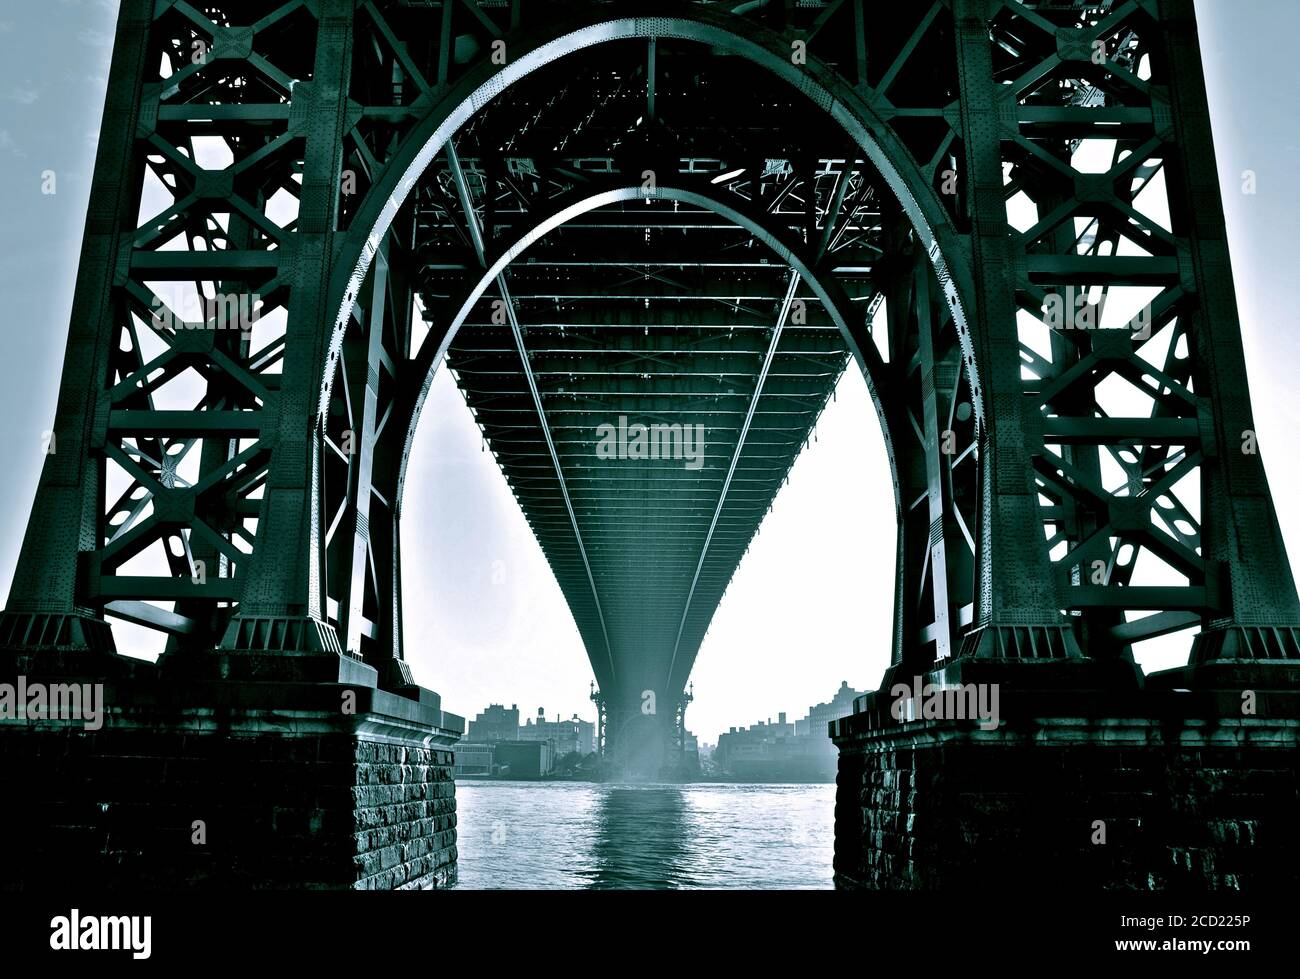 Le pont de Williamsburg, NEW YORK Banque D'Images